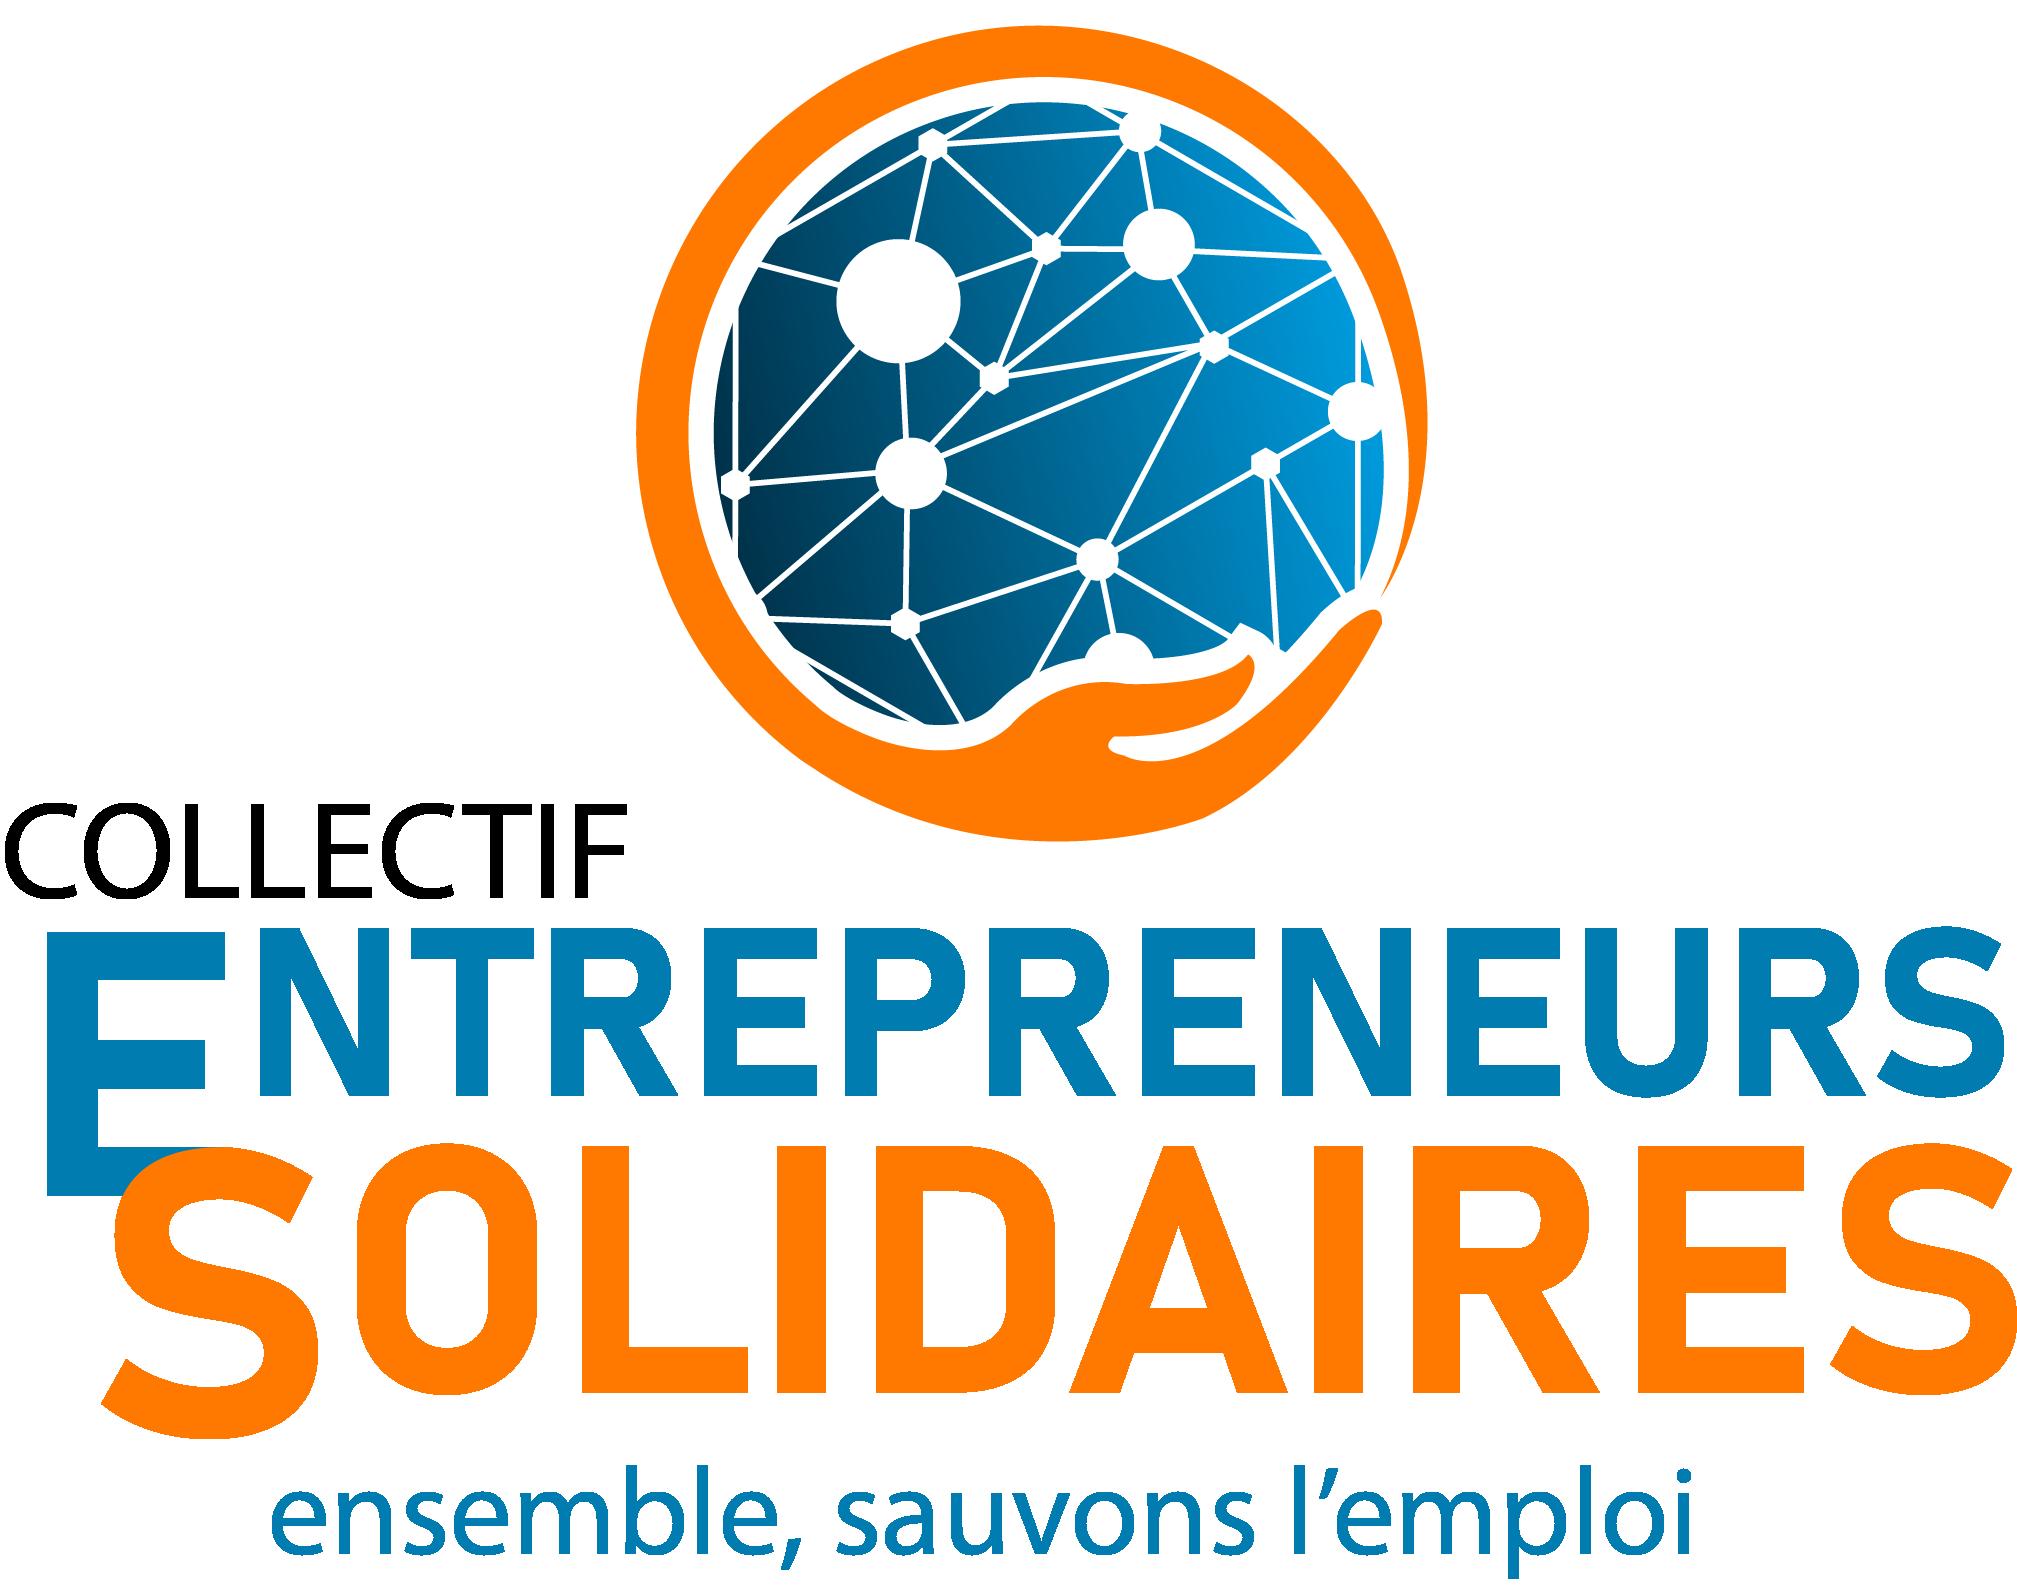 Entrepreneurs solidaires